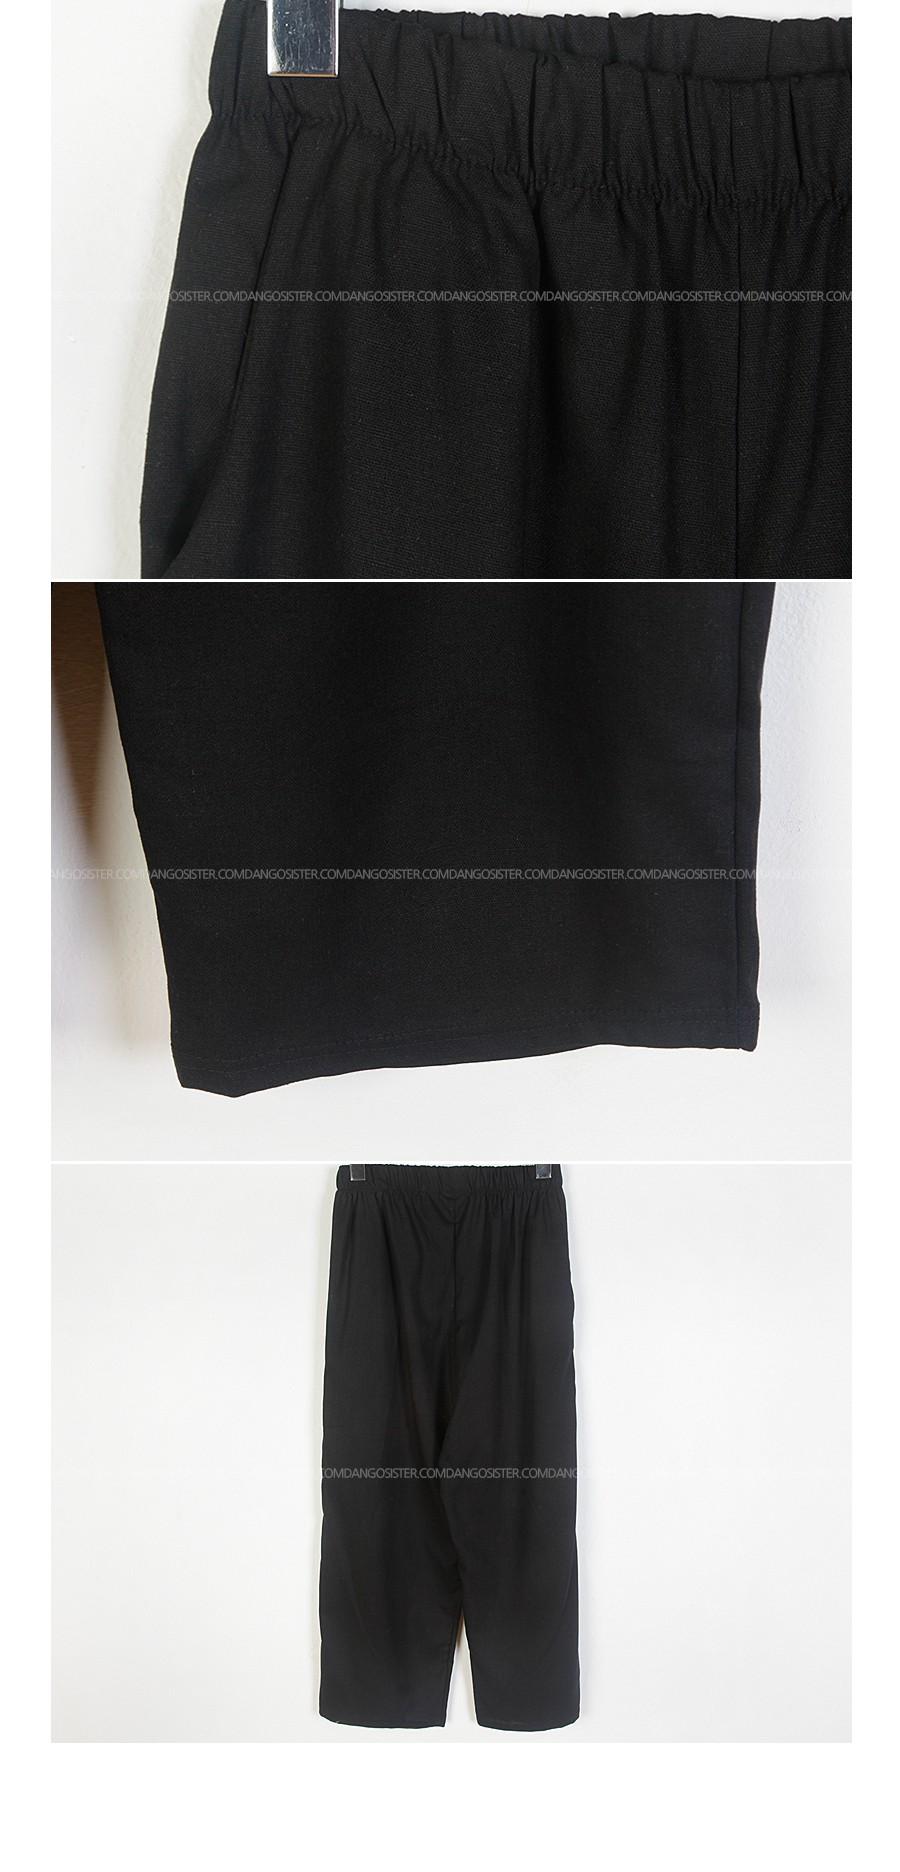 Big Gel Linen SET ♥ Linen Nash + Linen Banding Pants Set:)